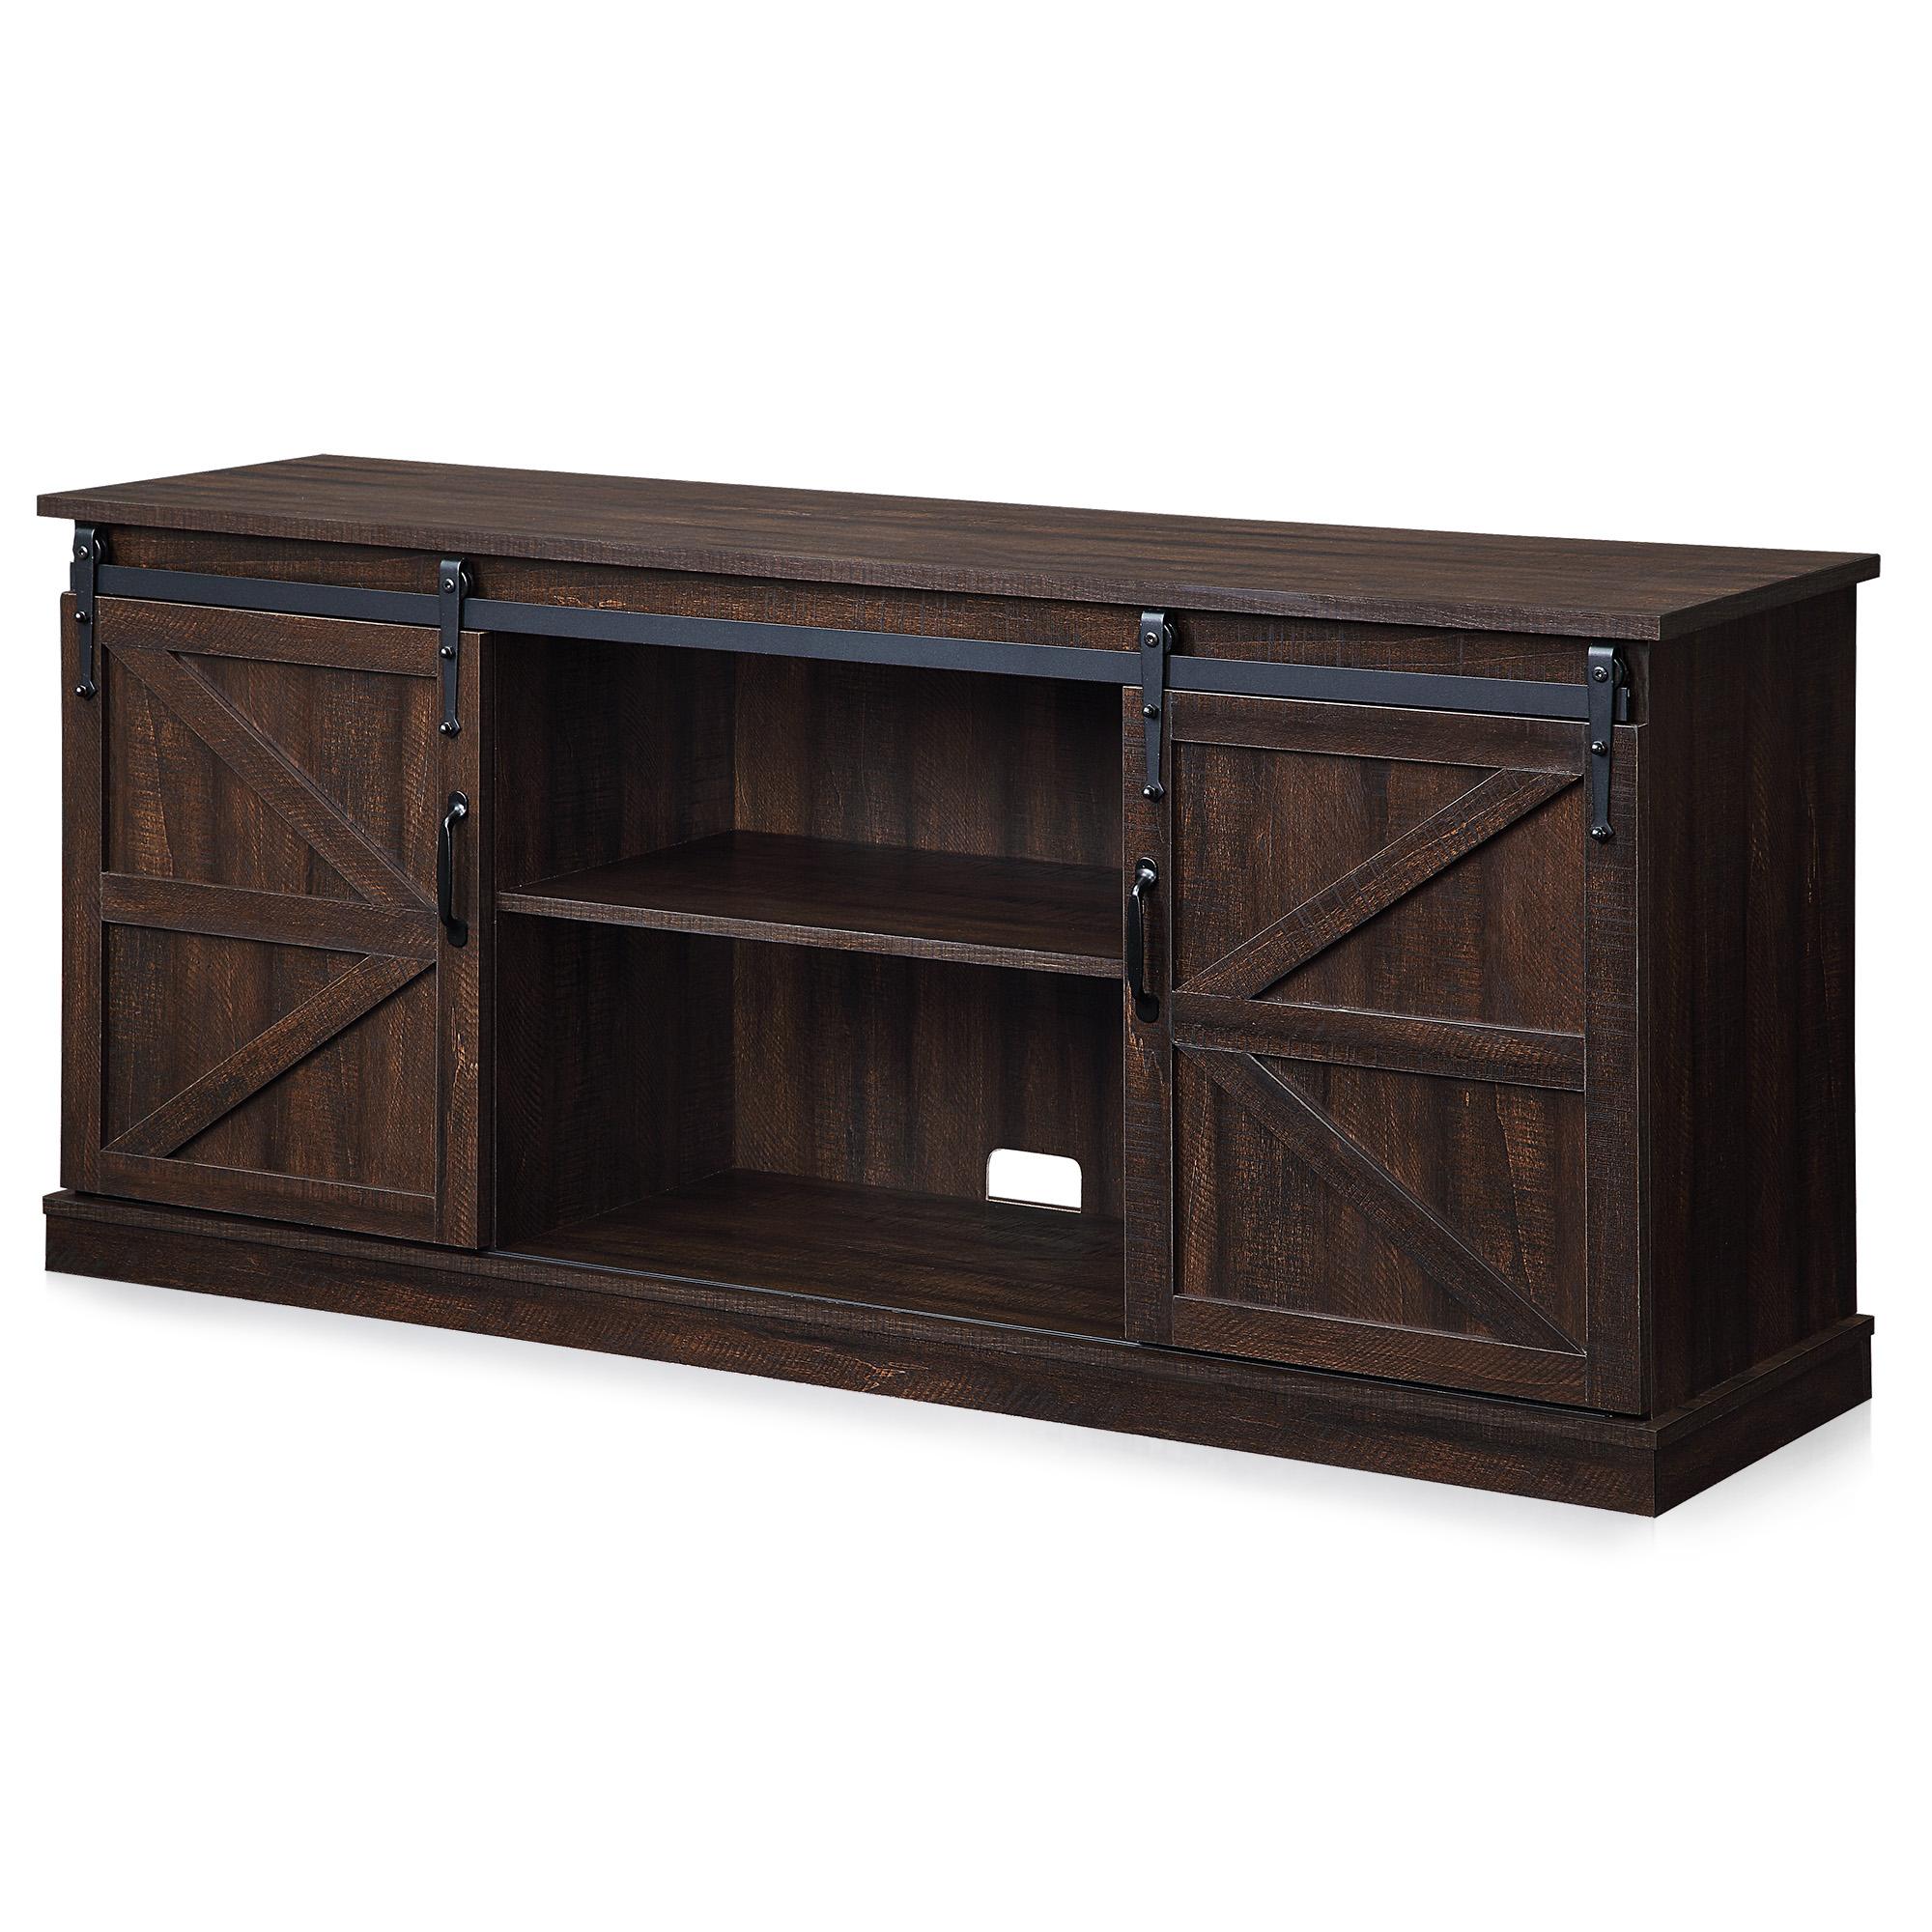 "Latest Jaxpety 58"" Farmhouse Sliding Barn Door Tv Stands With Espresso 58""tv Stand W/sliding Barn Door Console Table (View 8 of 10)"